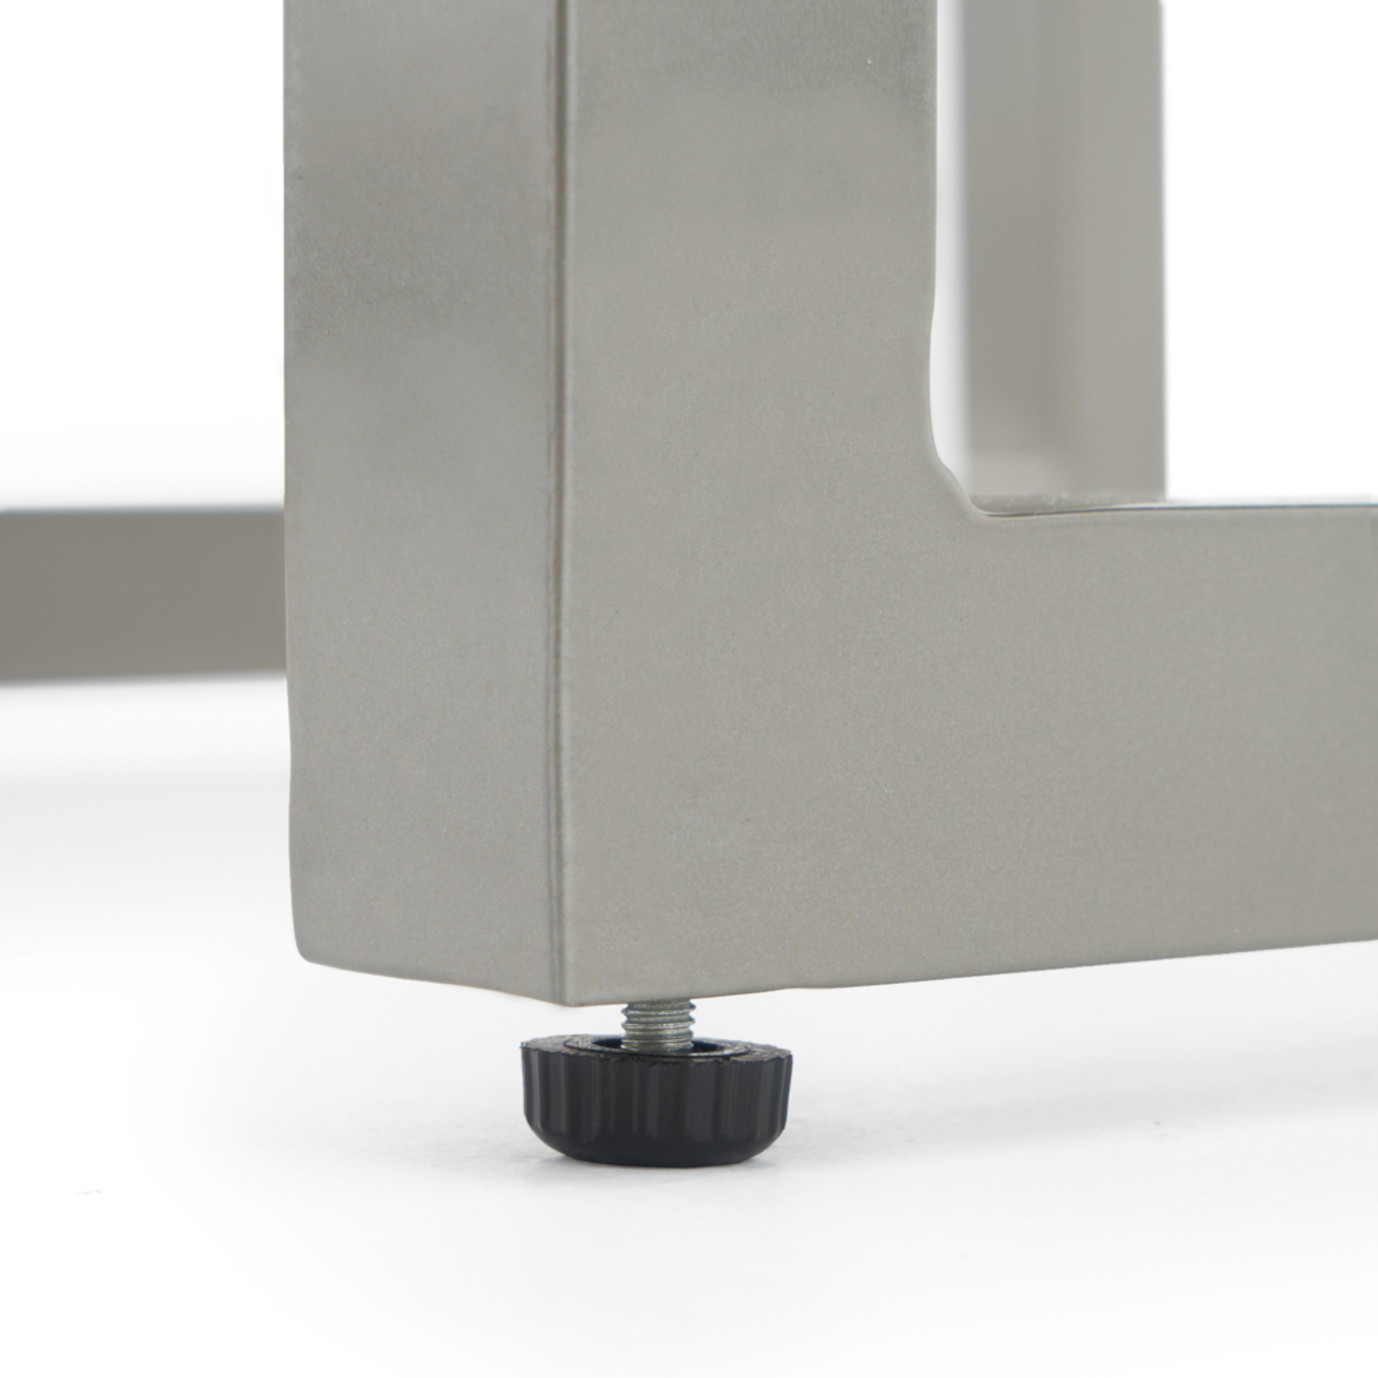 Milo™ Espresso 7pc Motion Deep Seating Set - Charcoal Gray